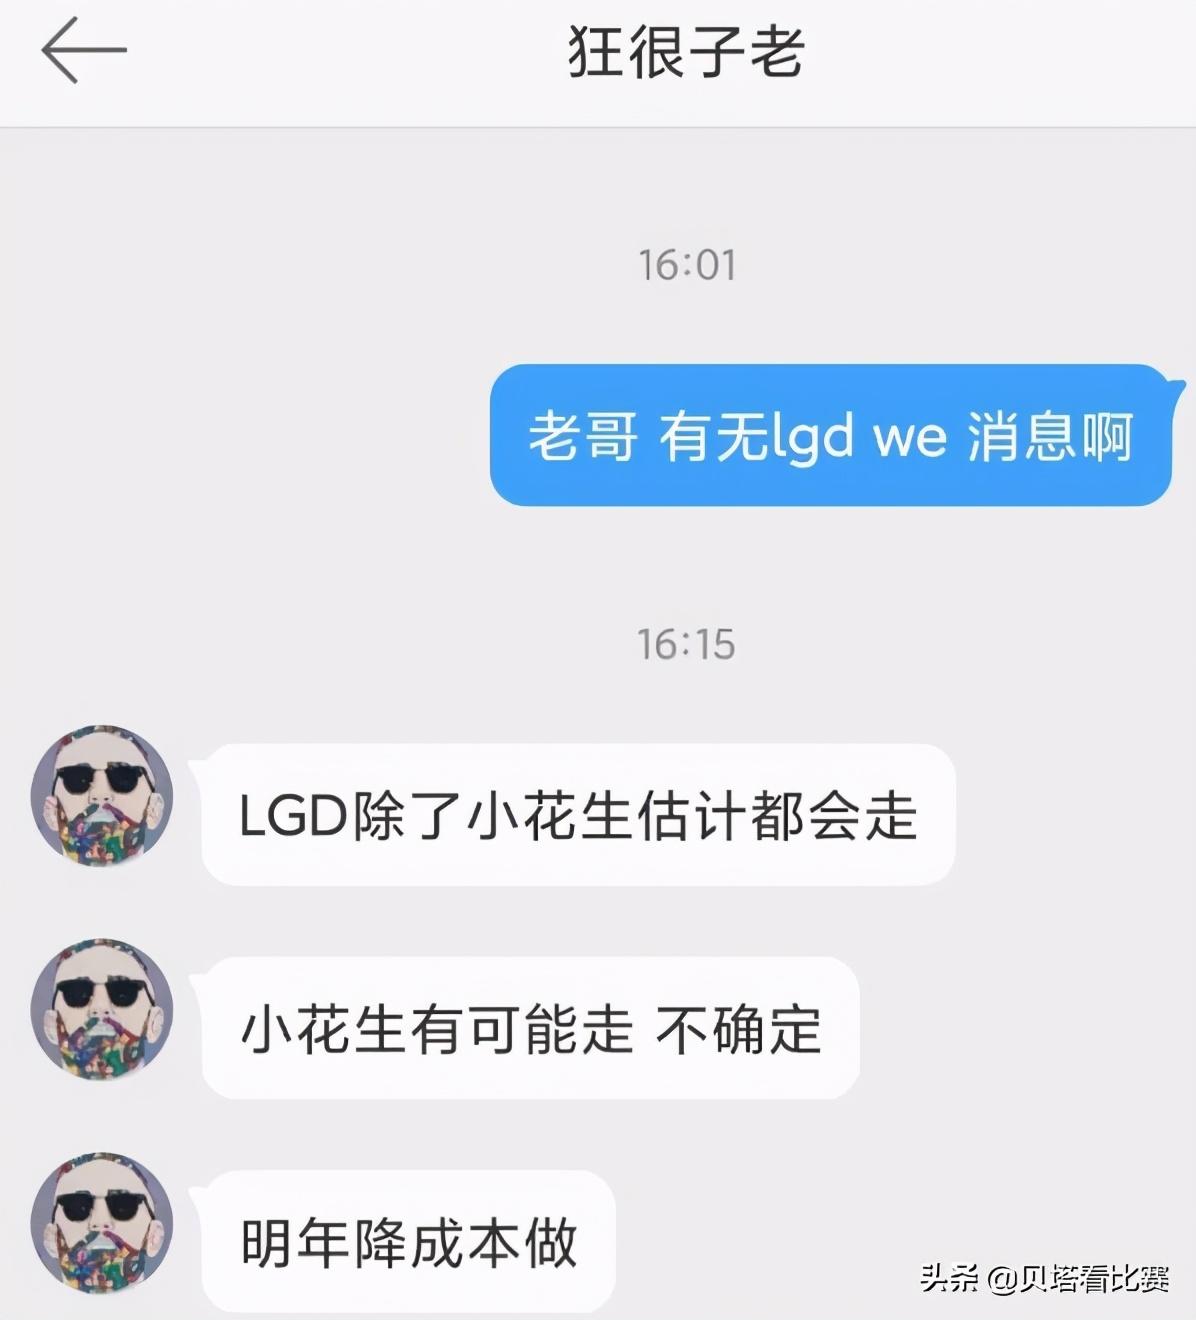 LGD倒了?知情人爆料:LGD主力5人,包括小花生都可能離隊